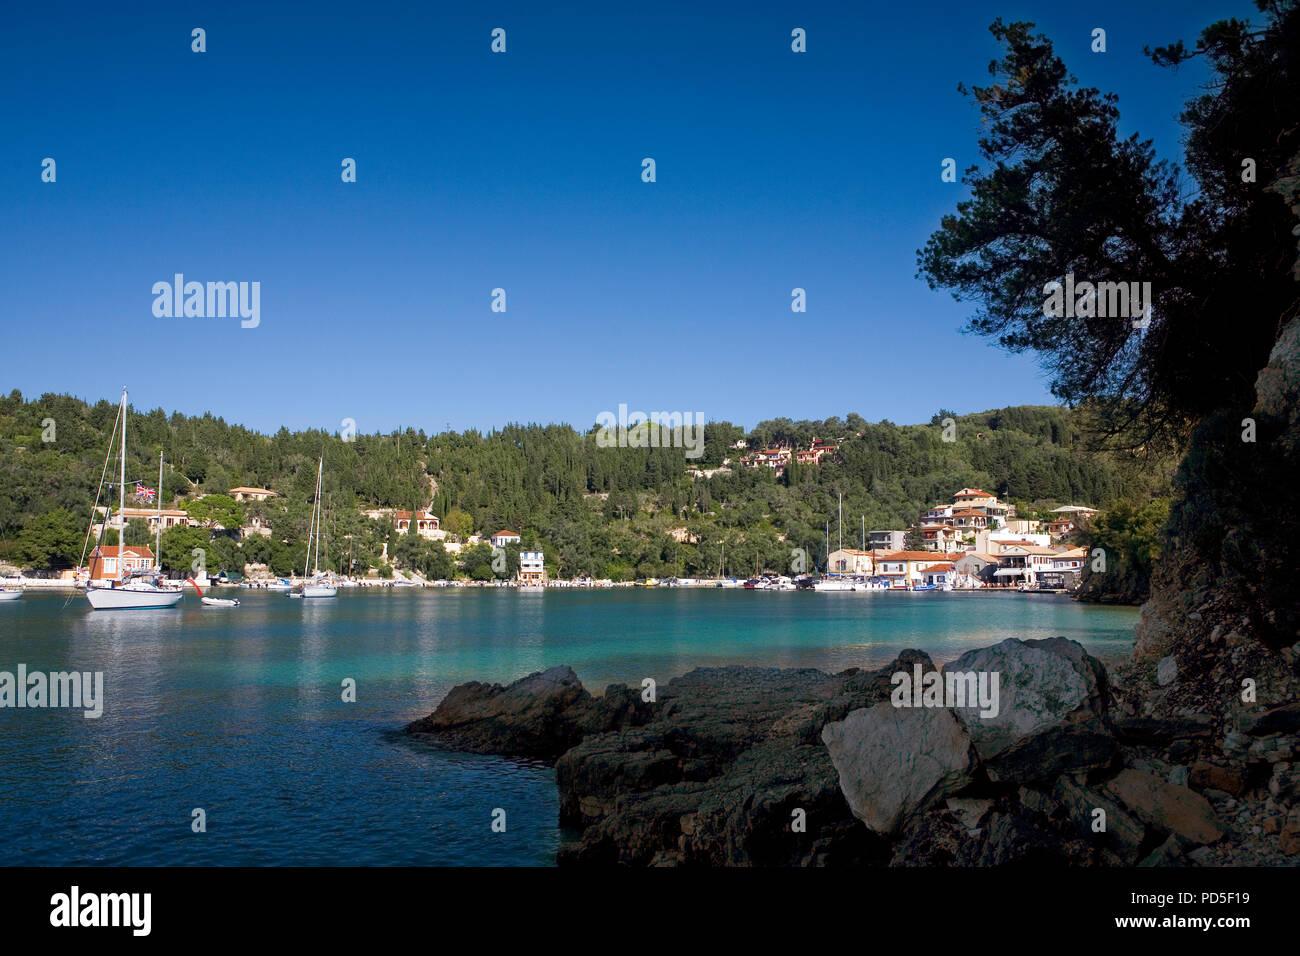 The pretty little harbourside village of Lakka, Paxos, Greece - Stock Image